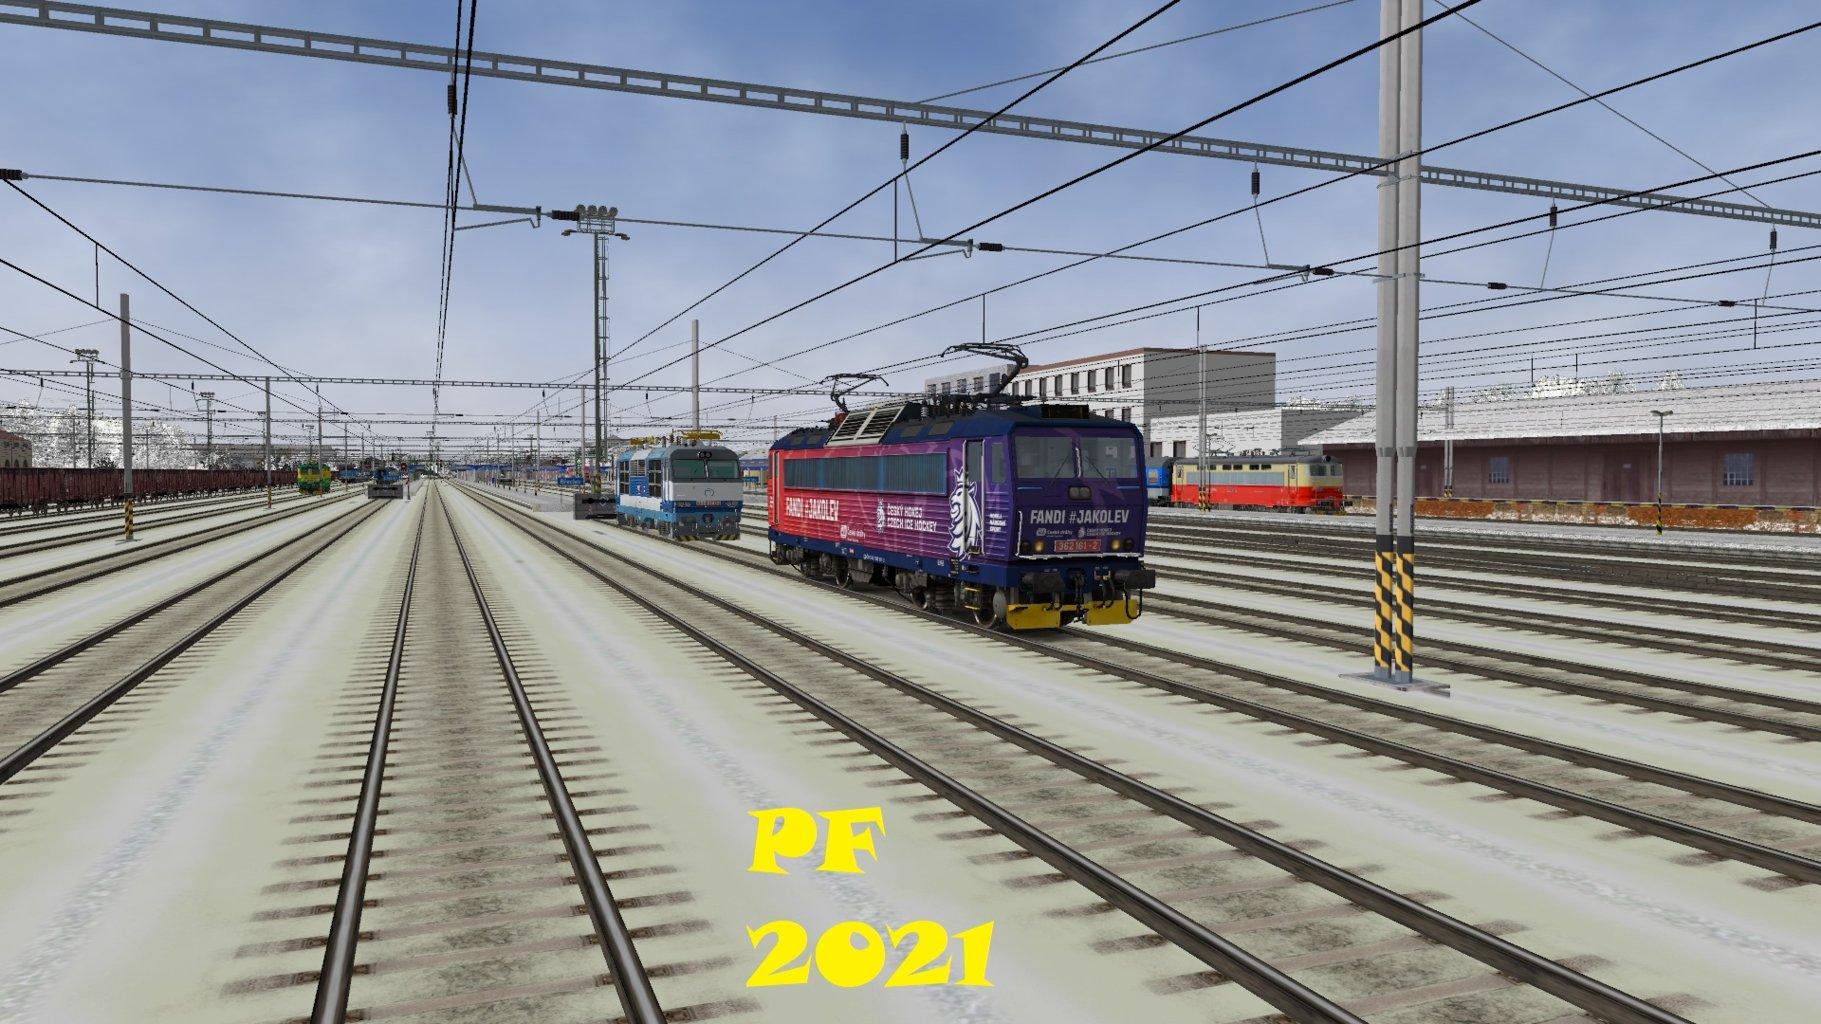 Open Rails 2020-11-18 06-41-19.jpg